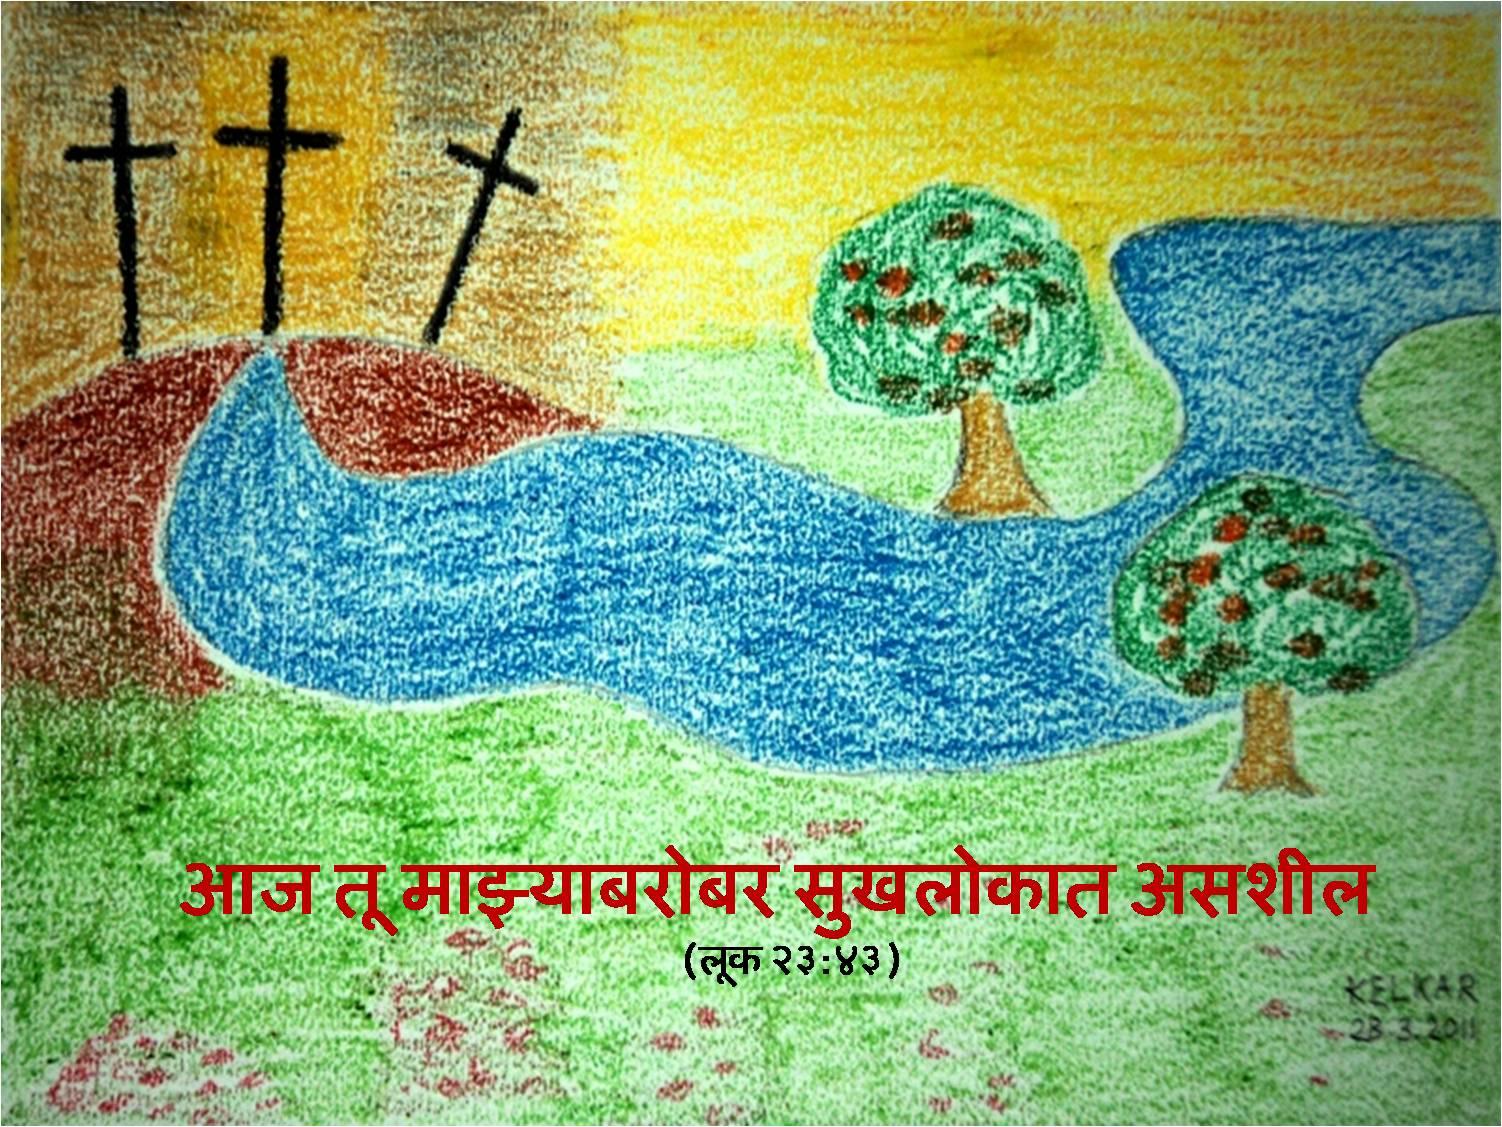 marathi bible wallpaper for - photo #38